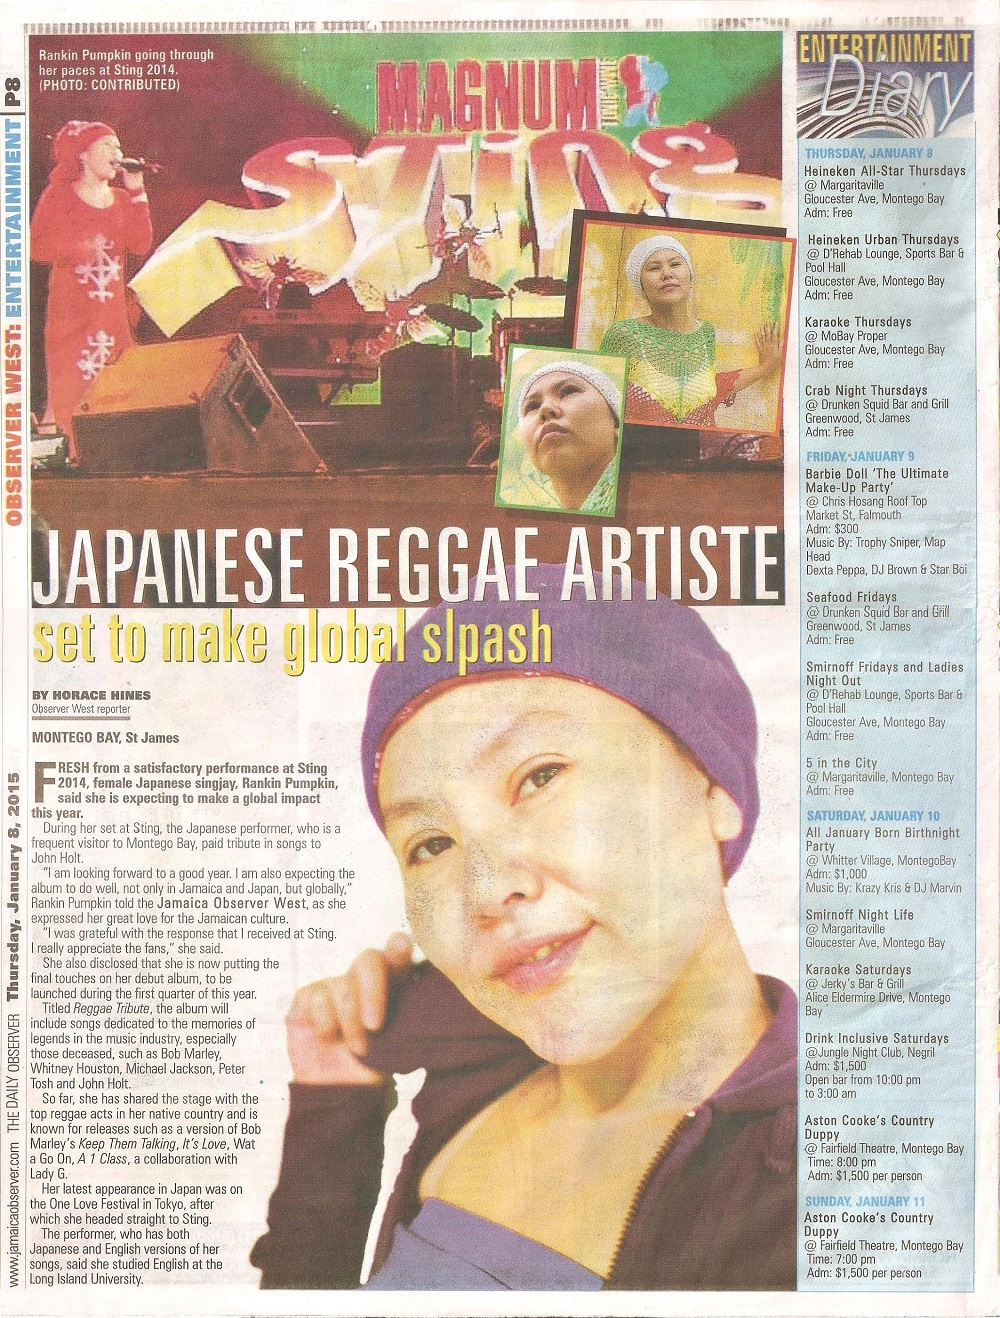 Rankin Pumpkin Observer Jamaica ランキン・パンプキン ジャマイカ新聞